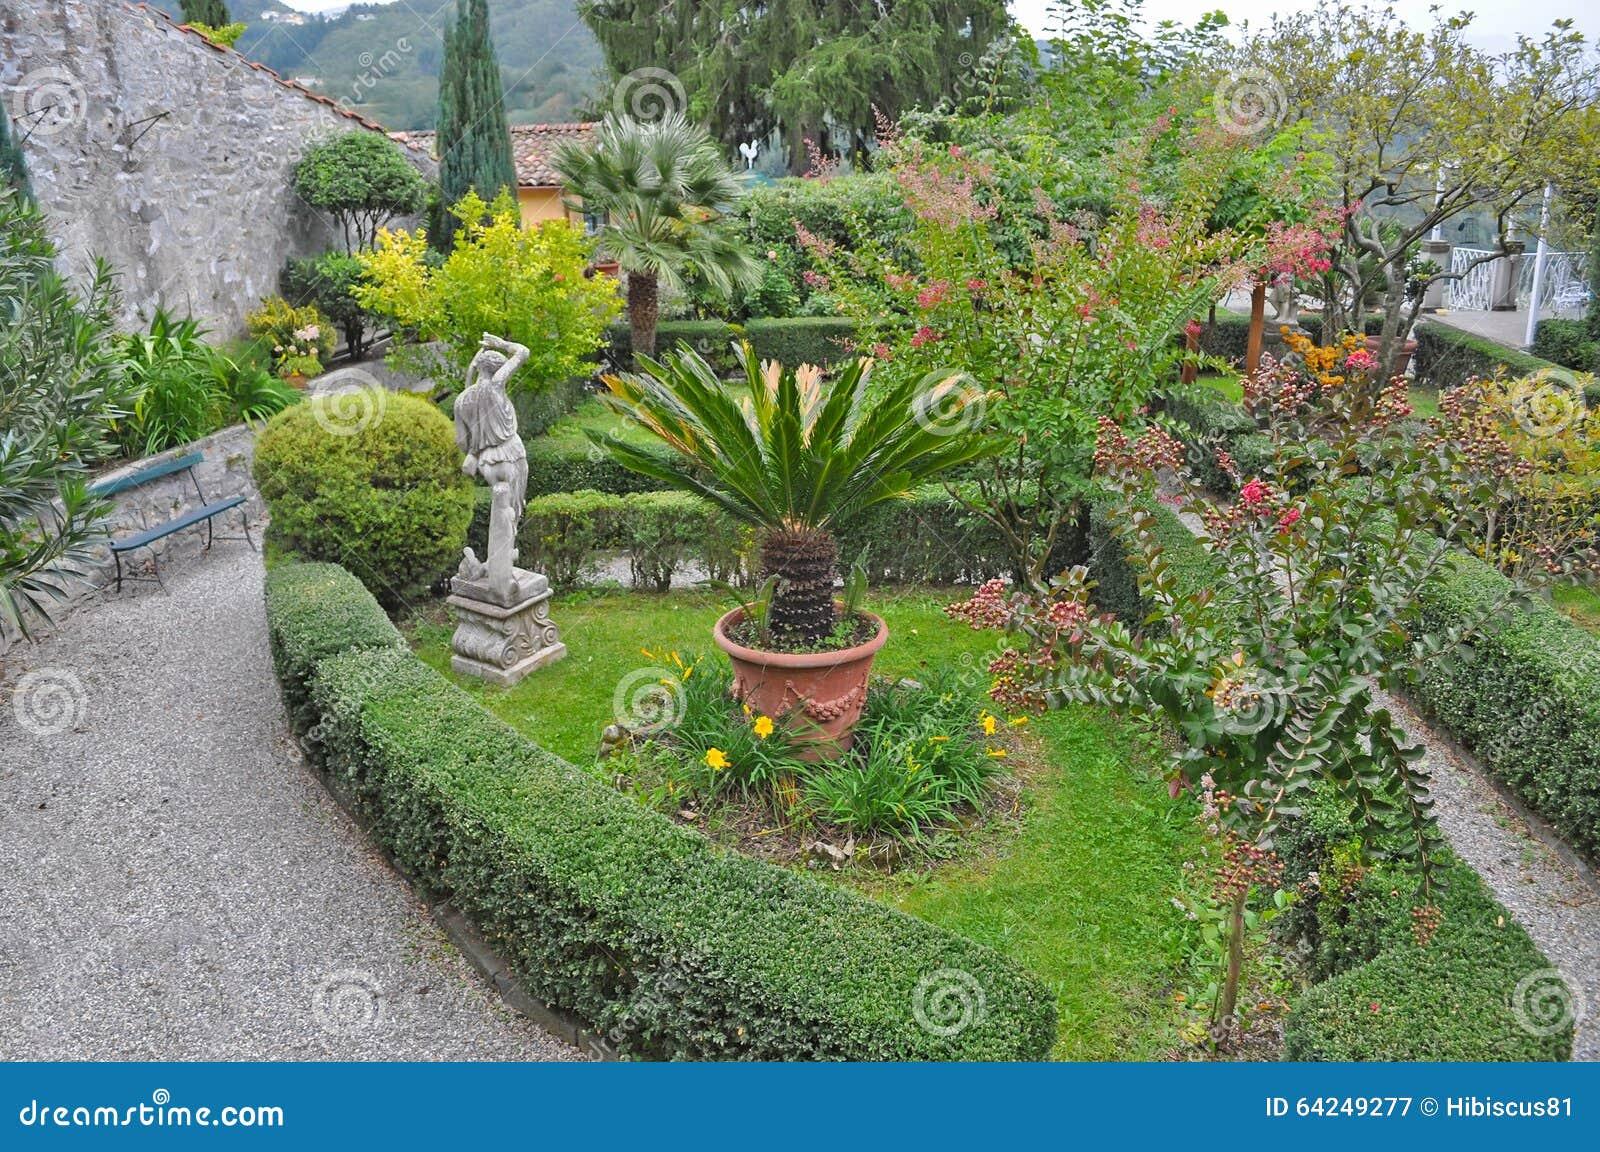 Garten in toskana stockfoto bild 64249277 - Toskana garten ...